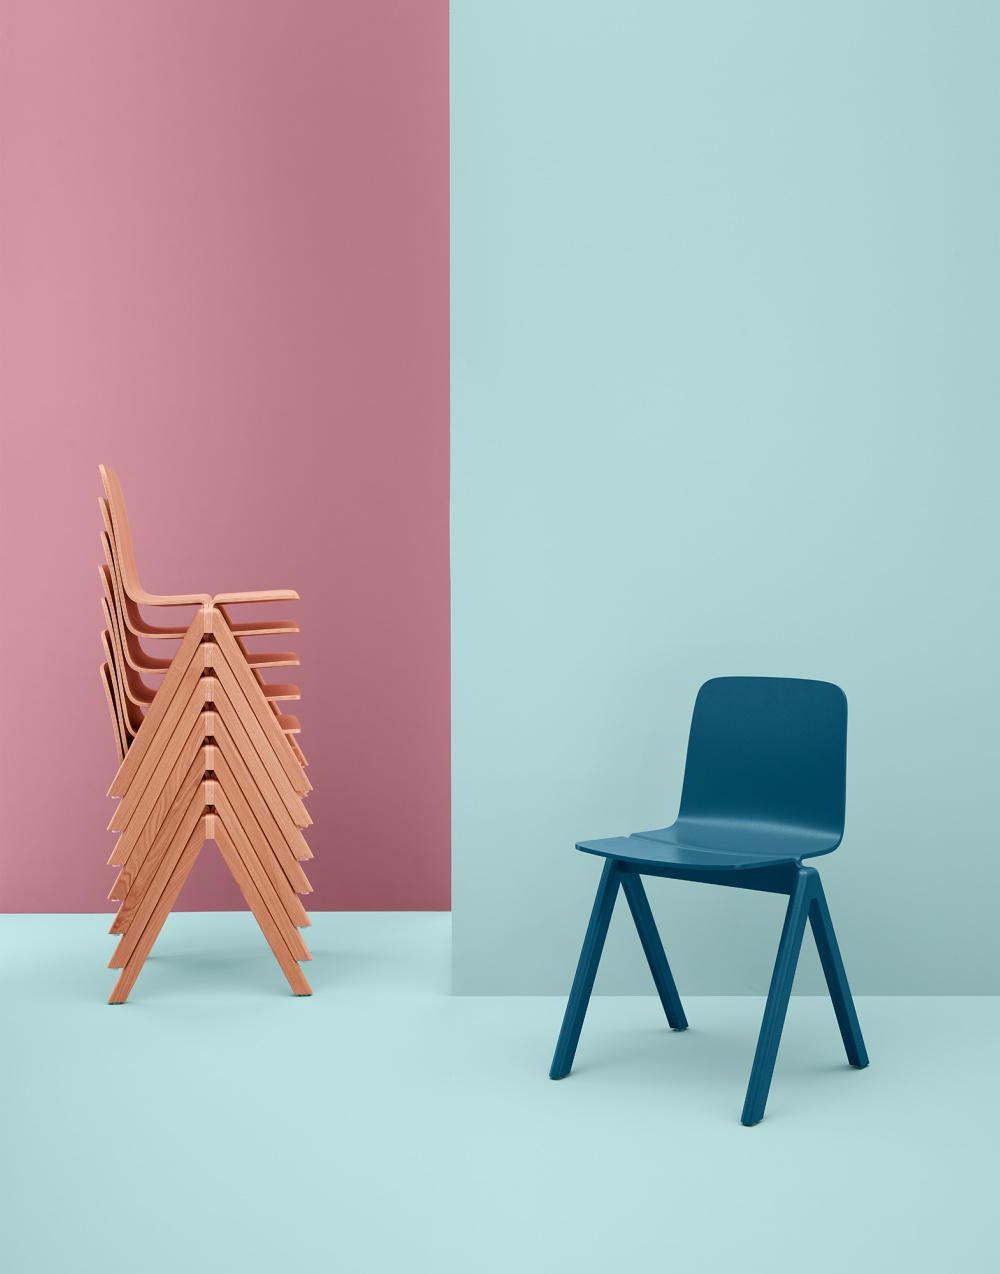 thumb-2-Copenhague Chair 01_2013-3-7_10-5-20